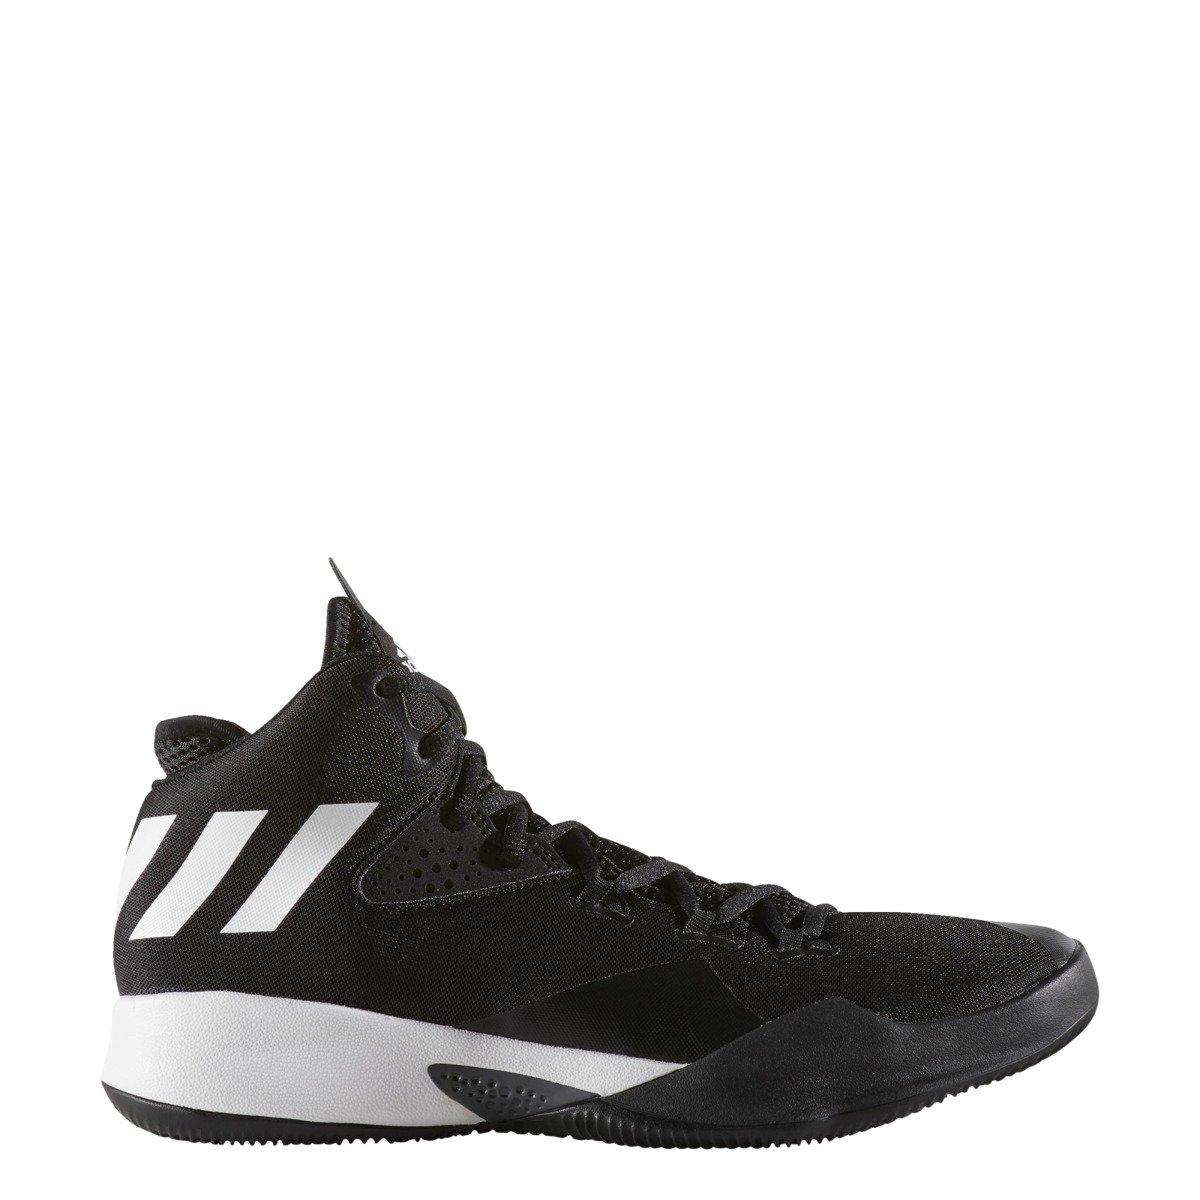 f1a6c9bf7ba1 Adidas Dual Threat 2017 Shoes - BY4182